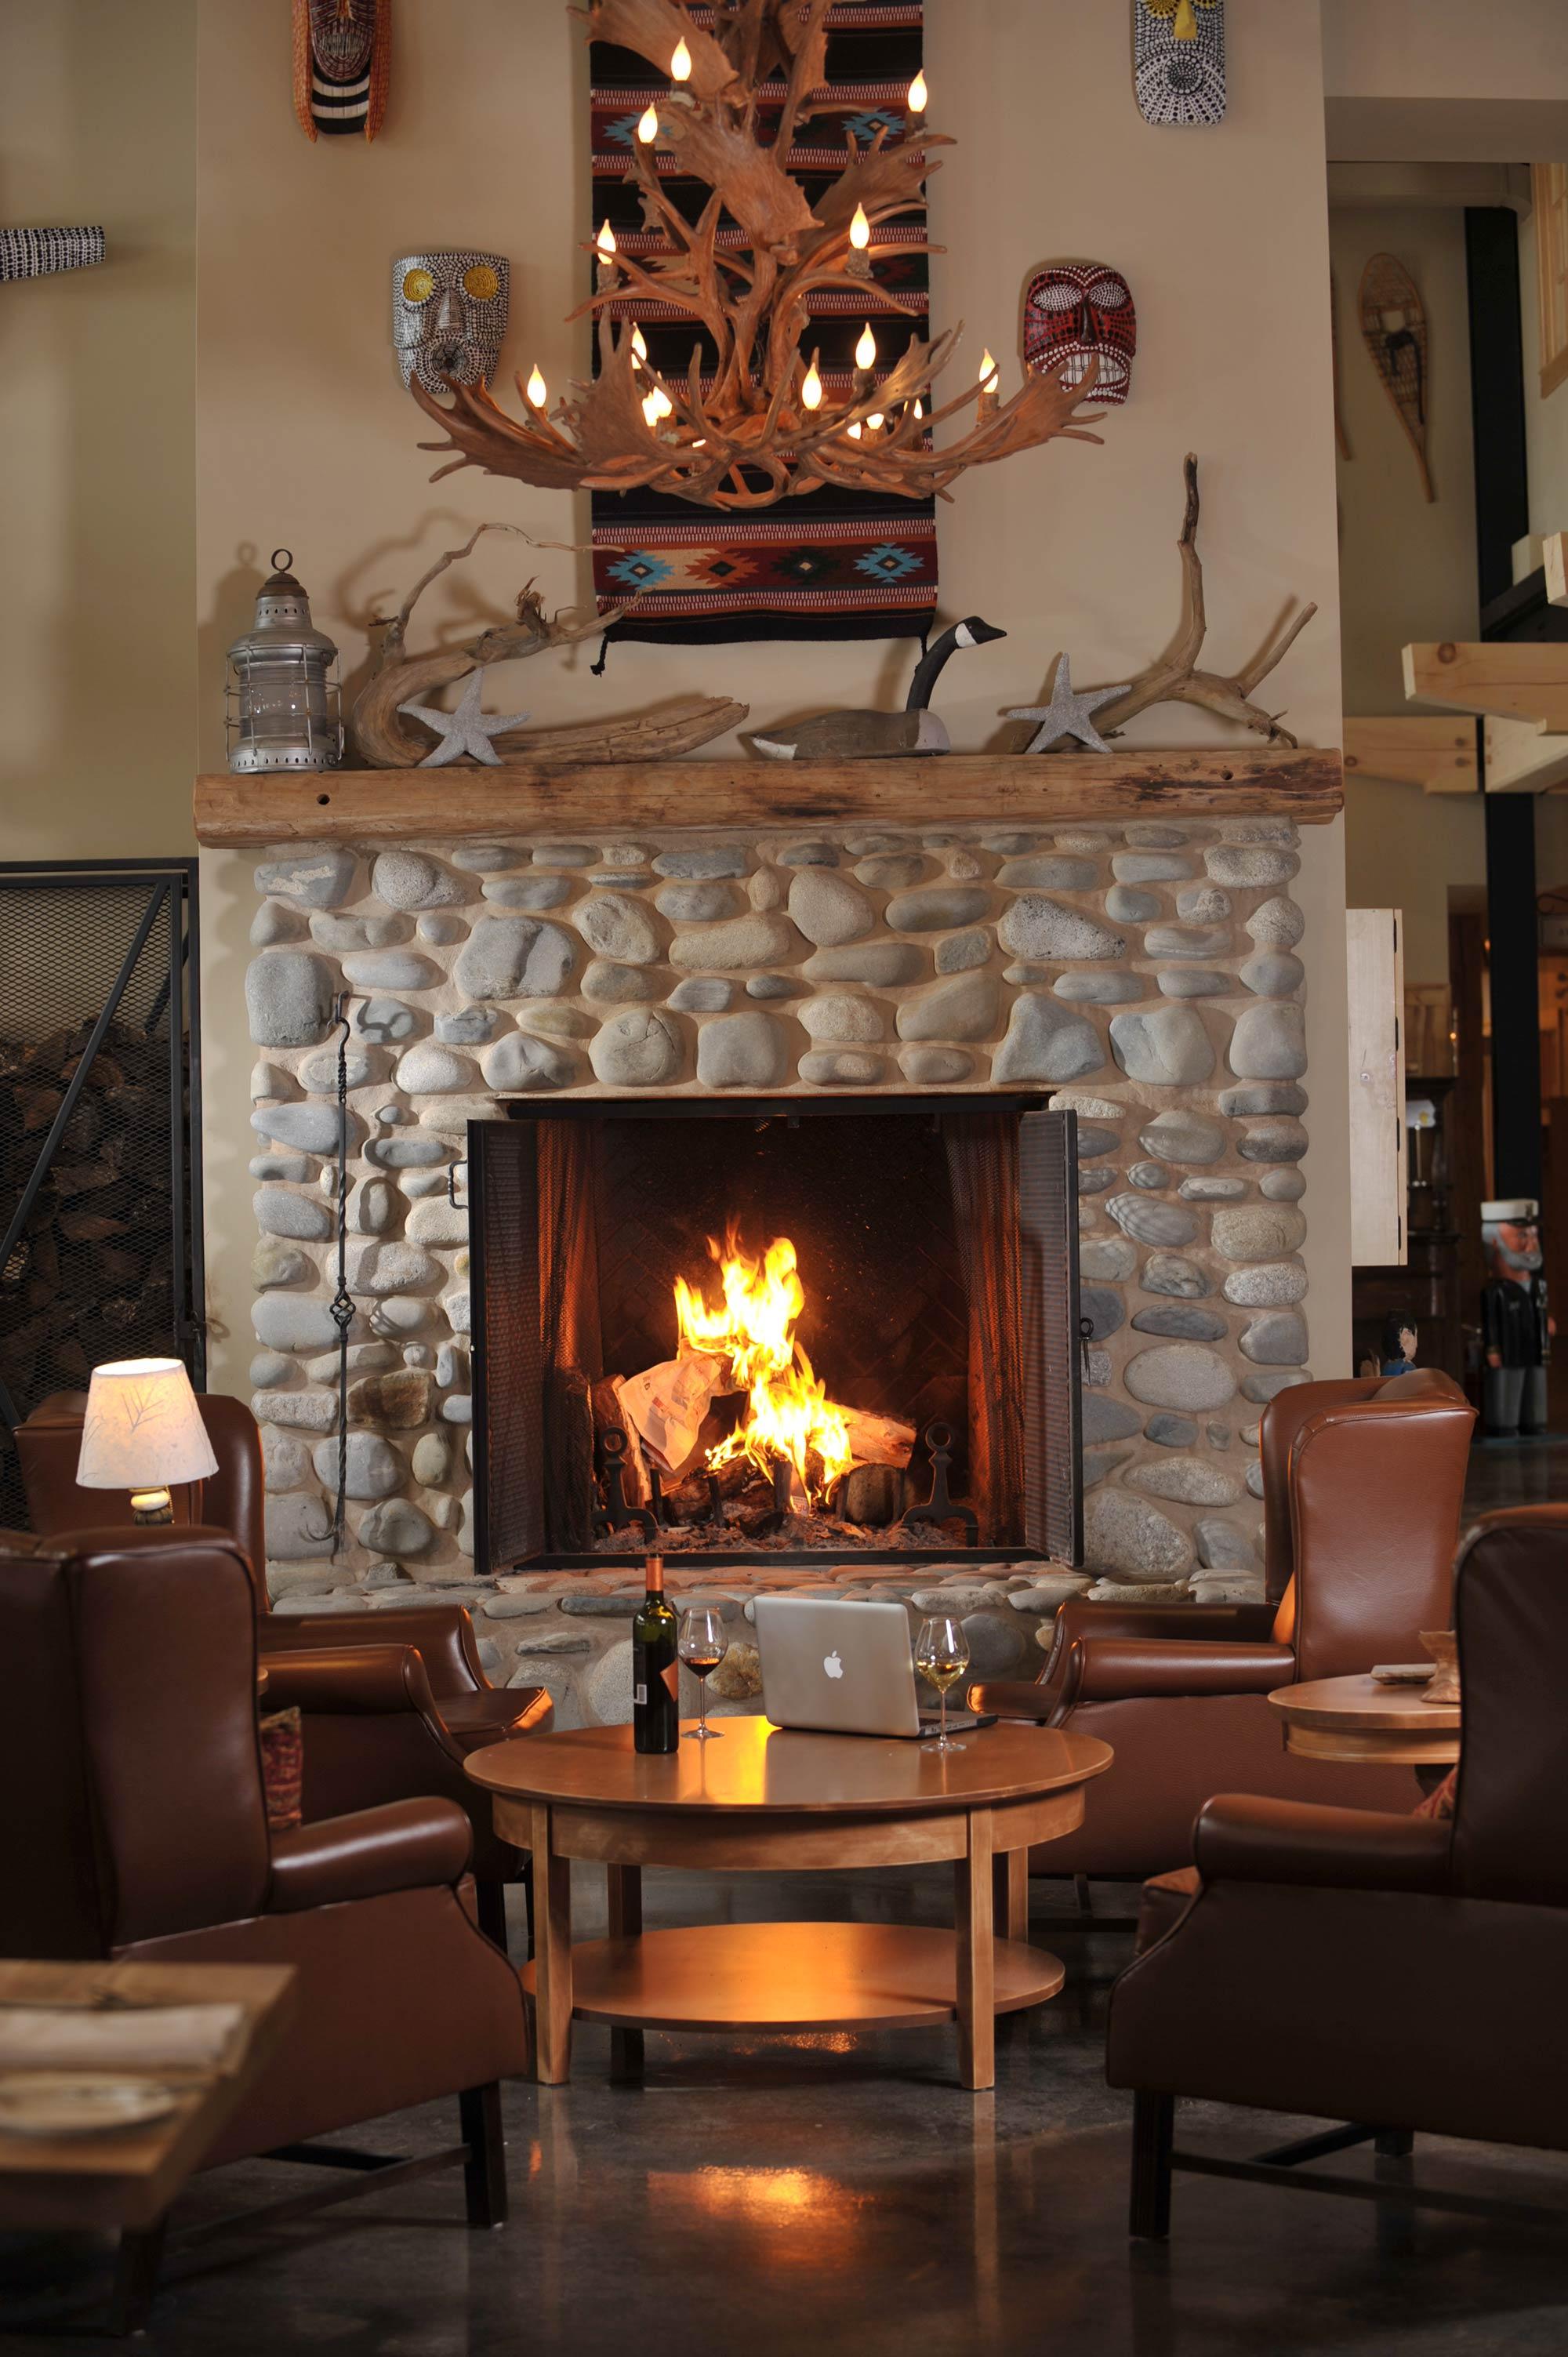 interior-design-restuarant-nova-scotia-dining-fireplace.jpg